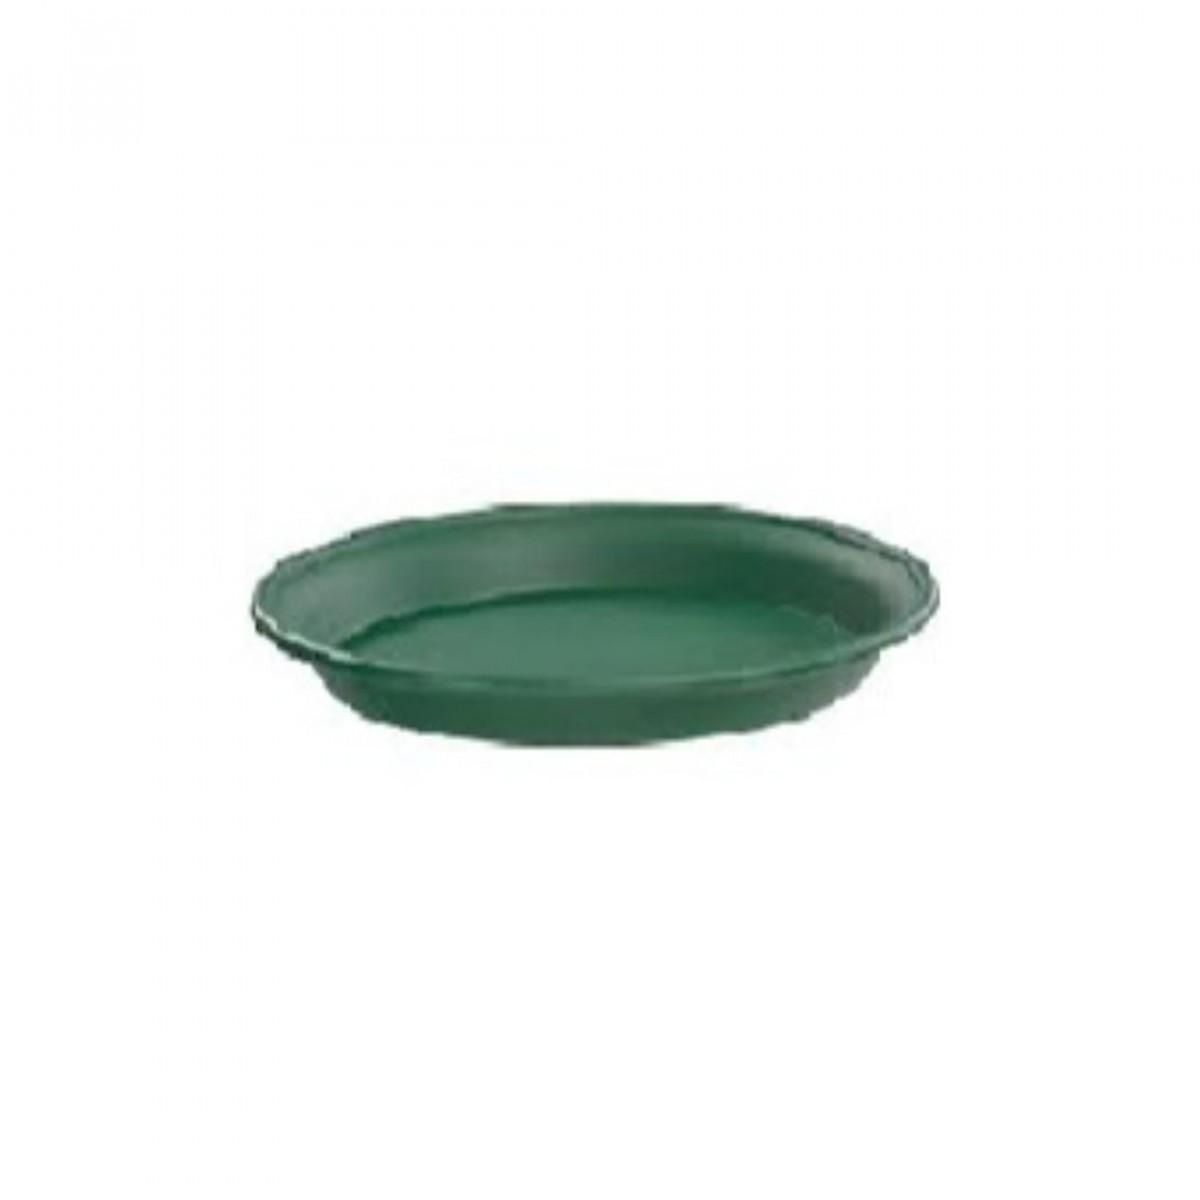 20CM Plastic Tray Green - 10 No